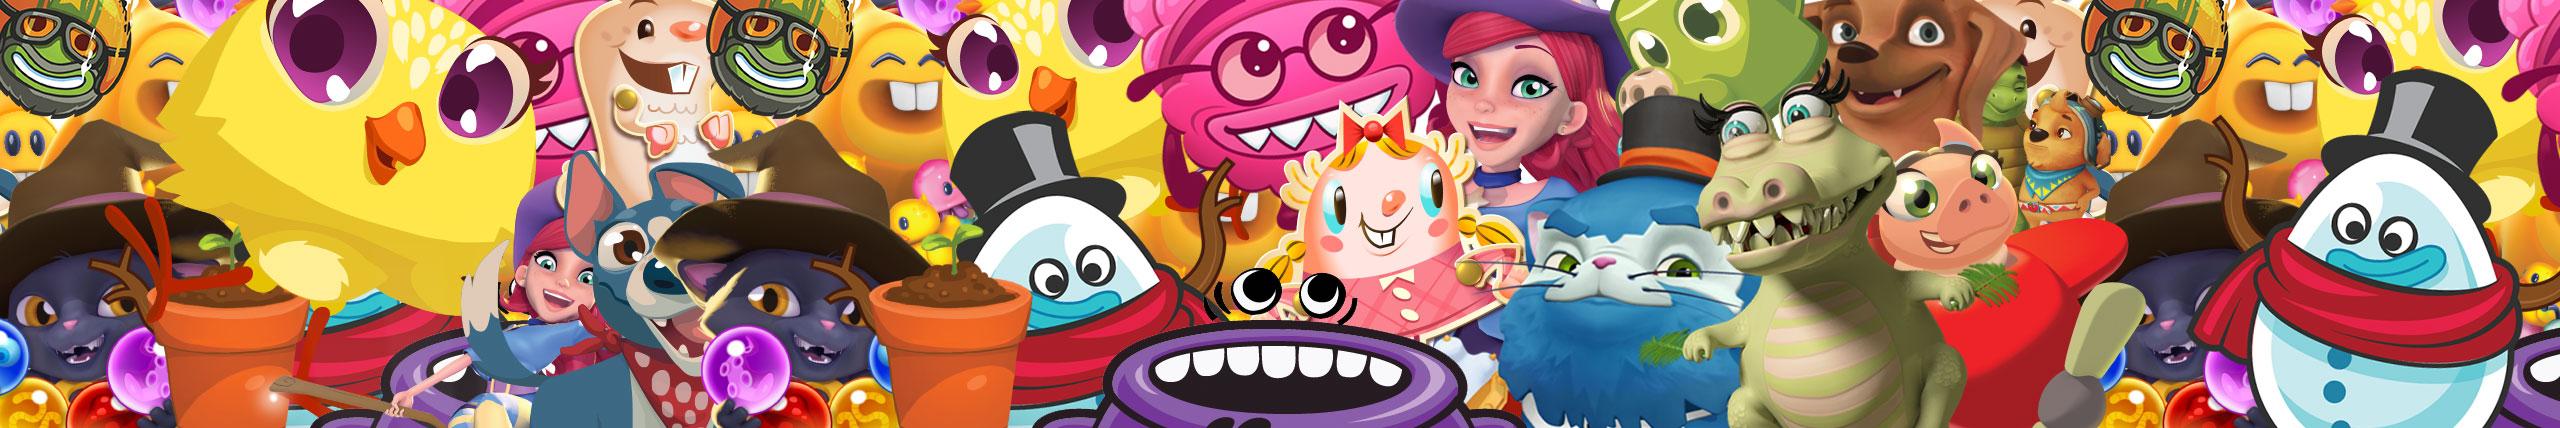 King - Activision